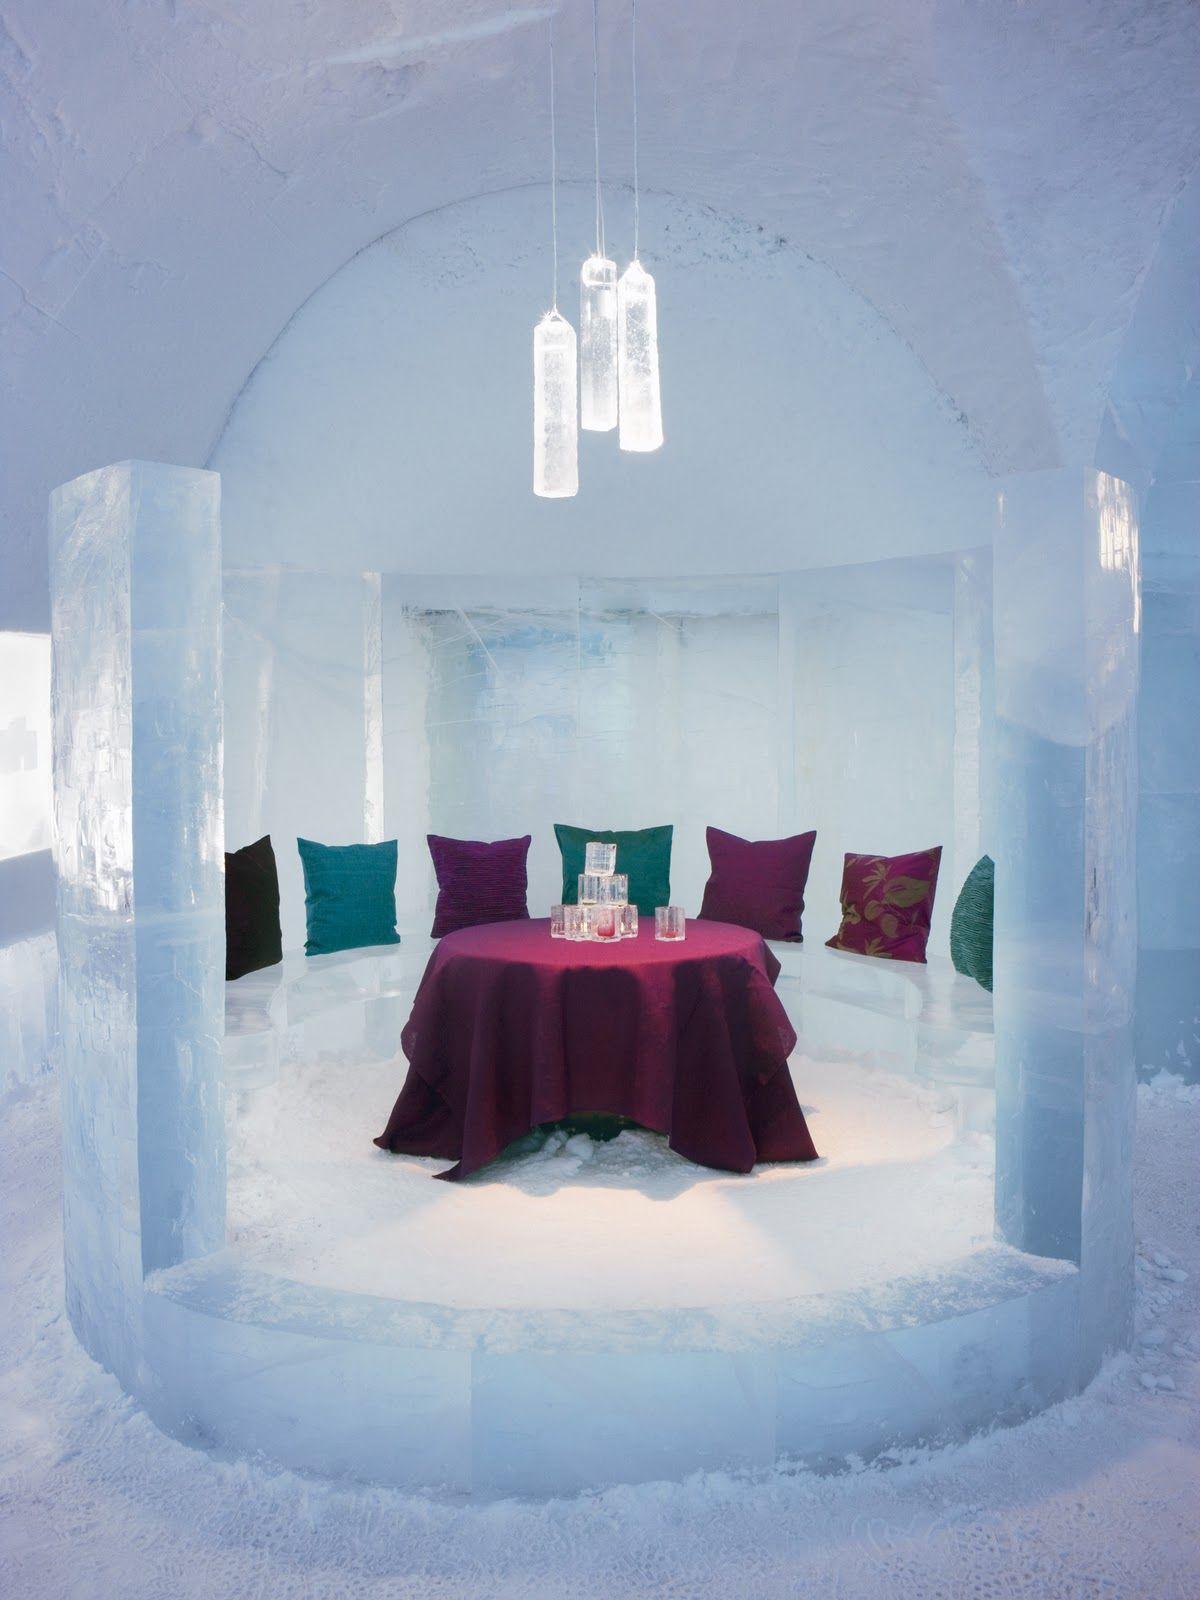 Ice Hotel Jukkasjärvi Sweden | (N)Ice Hotel | Pinterest | Eishotel ...